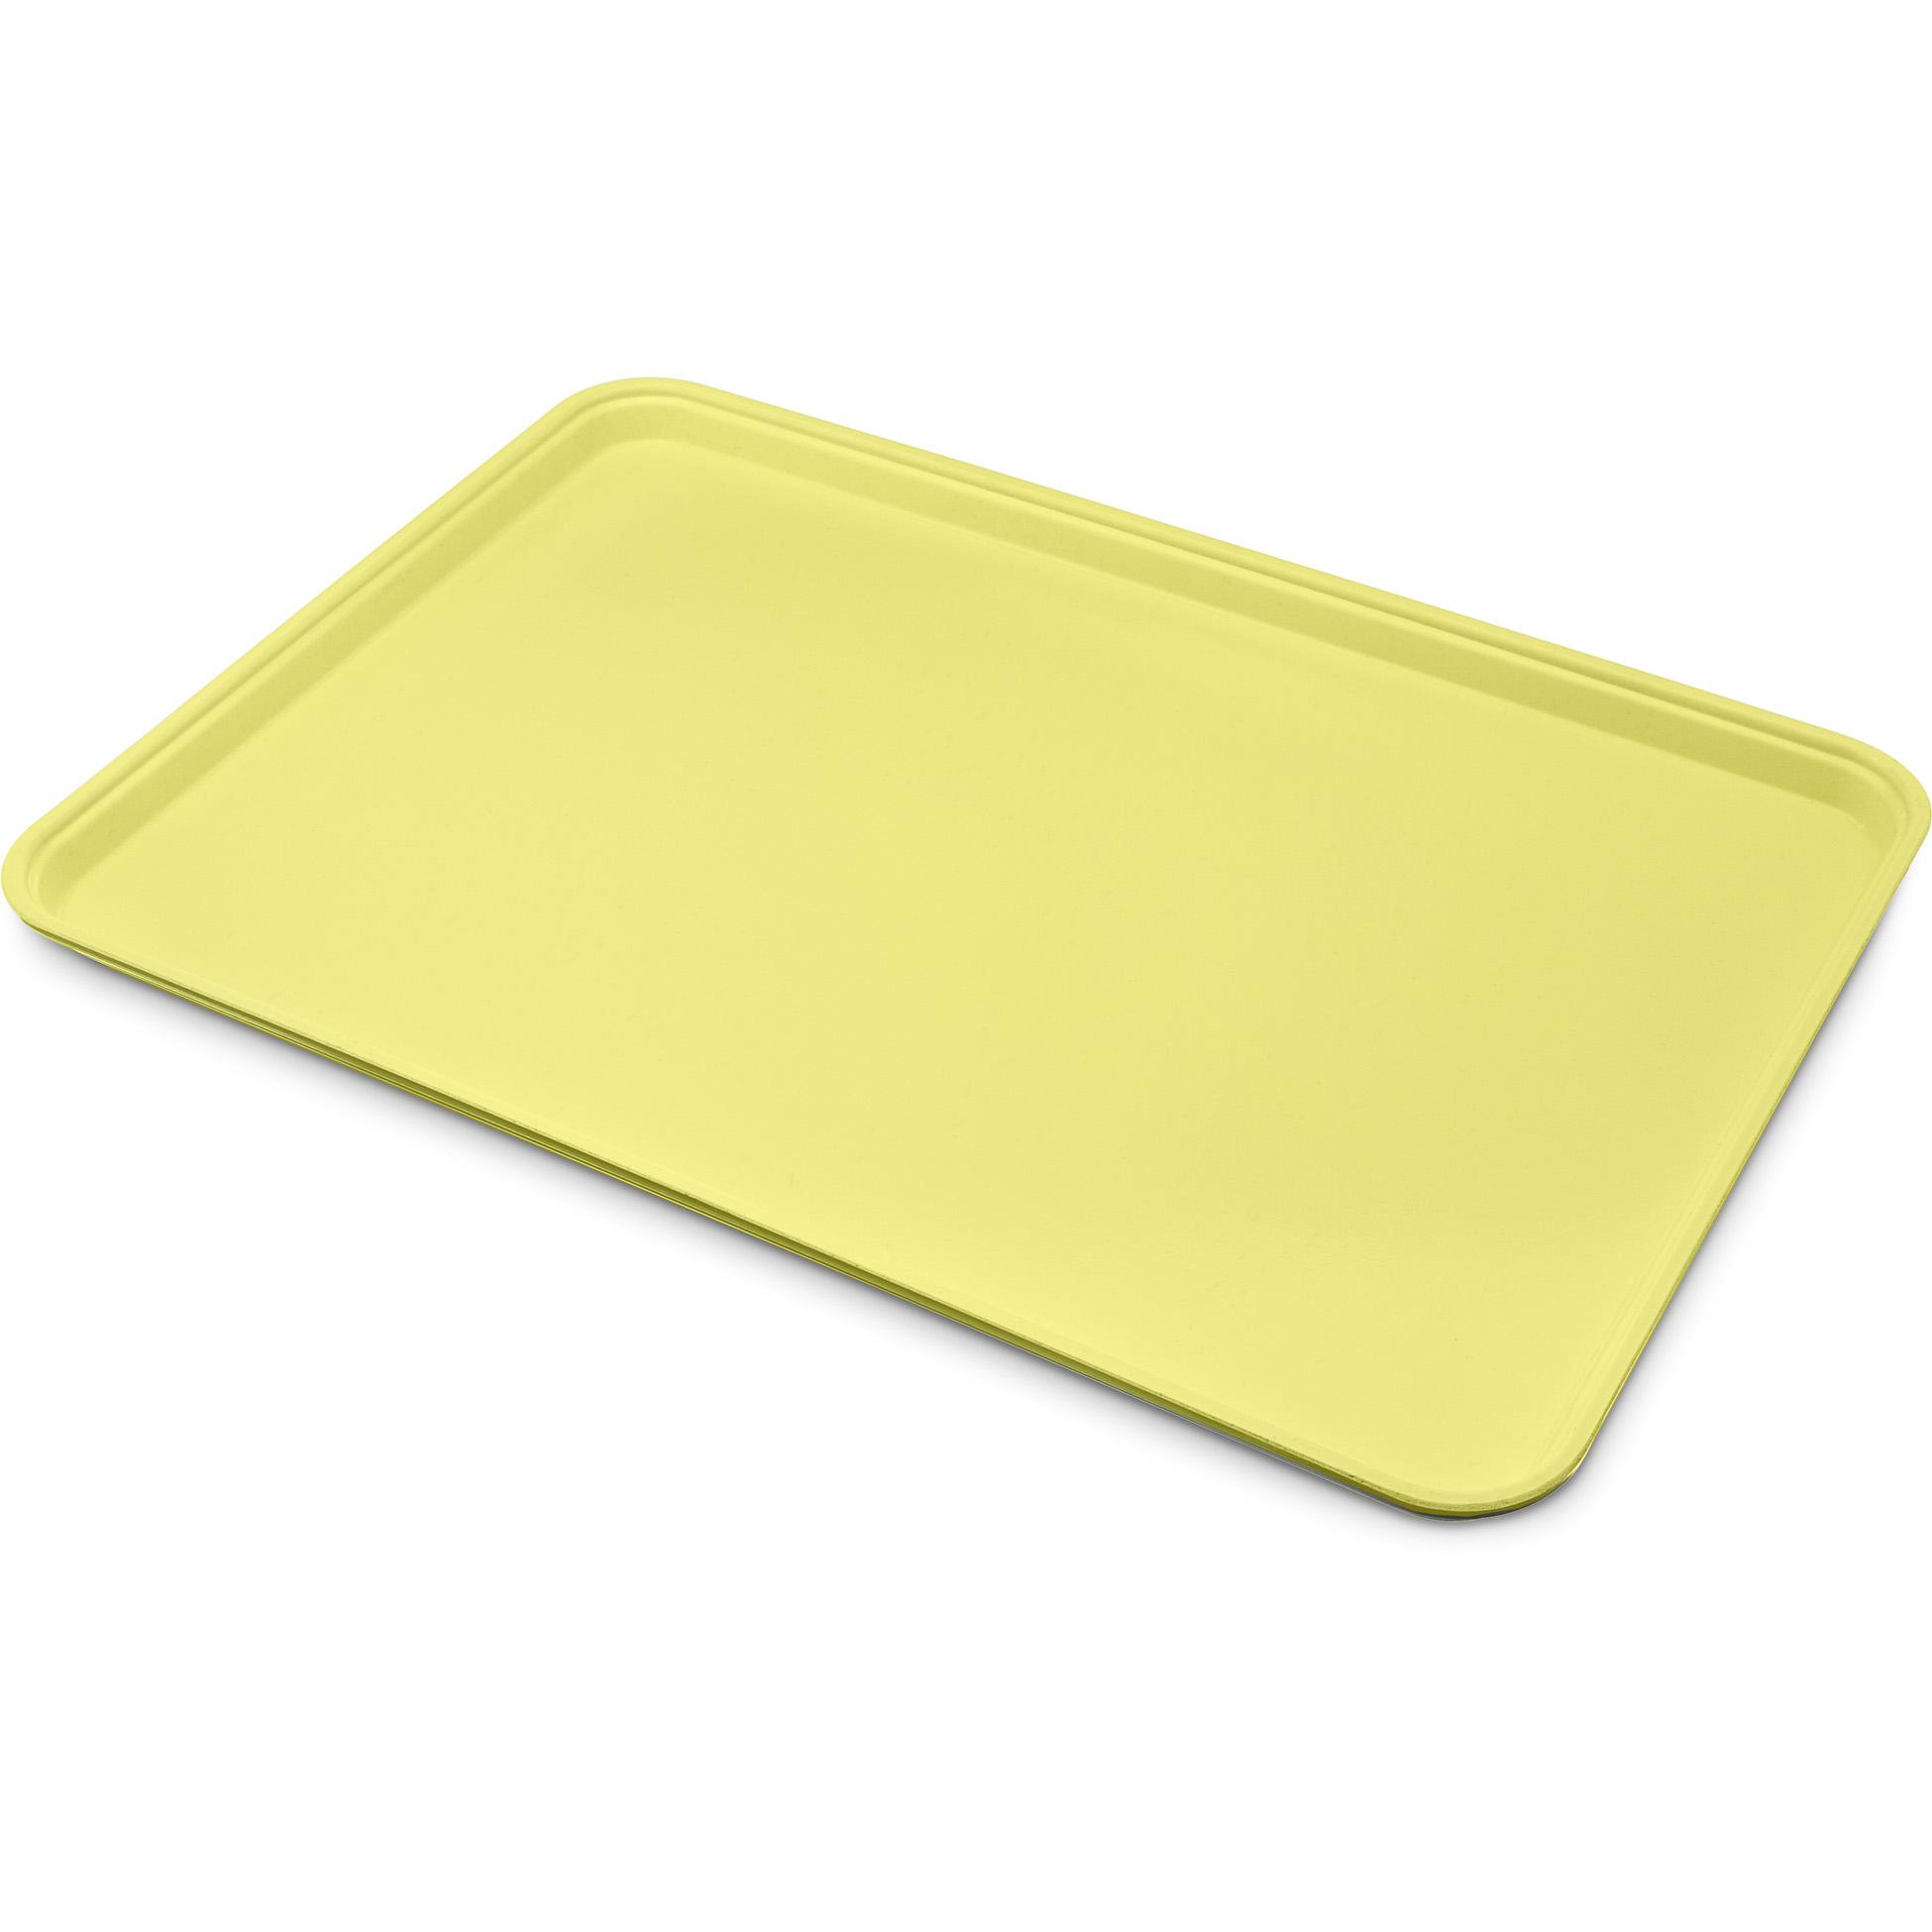 Carlisle 2618FGQ021 display tray, market / bakery